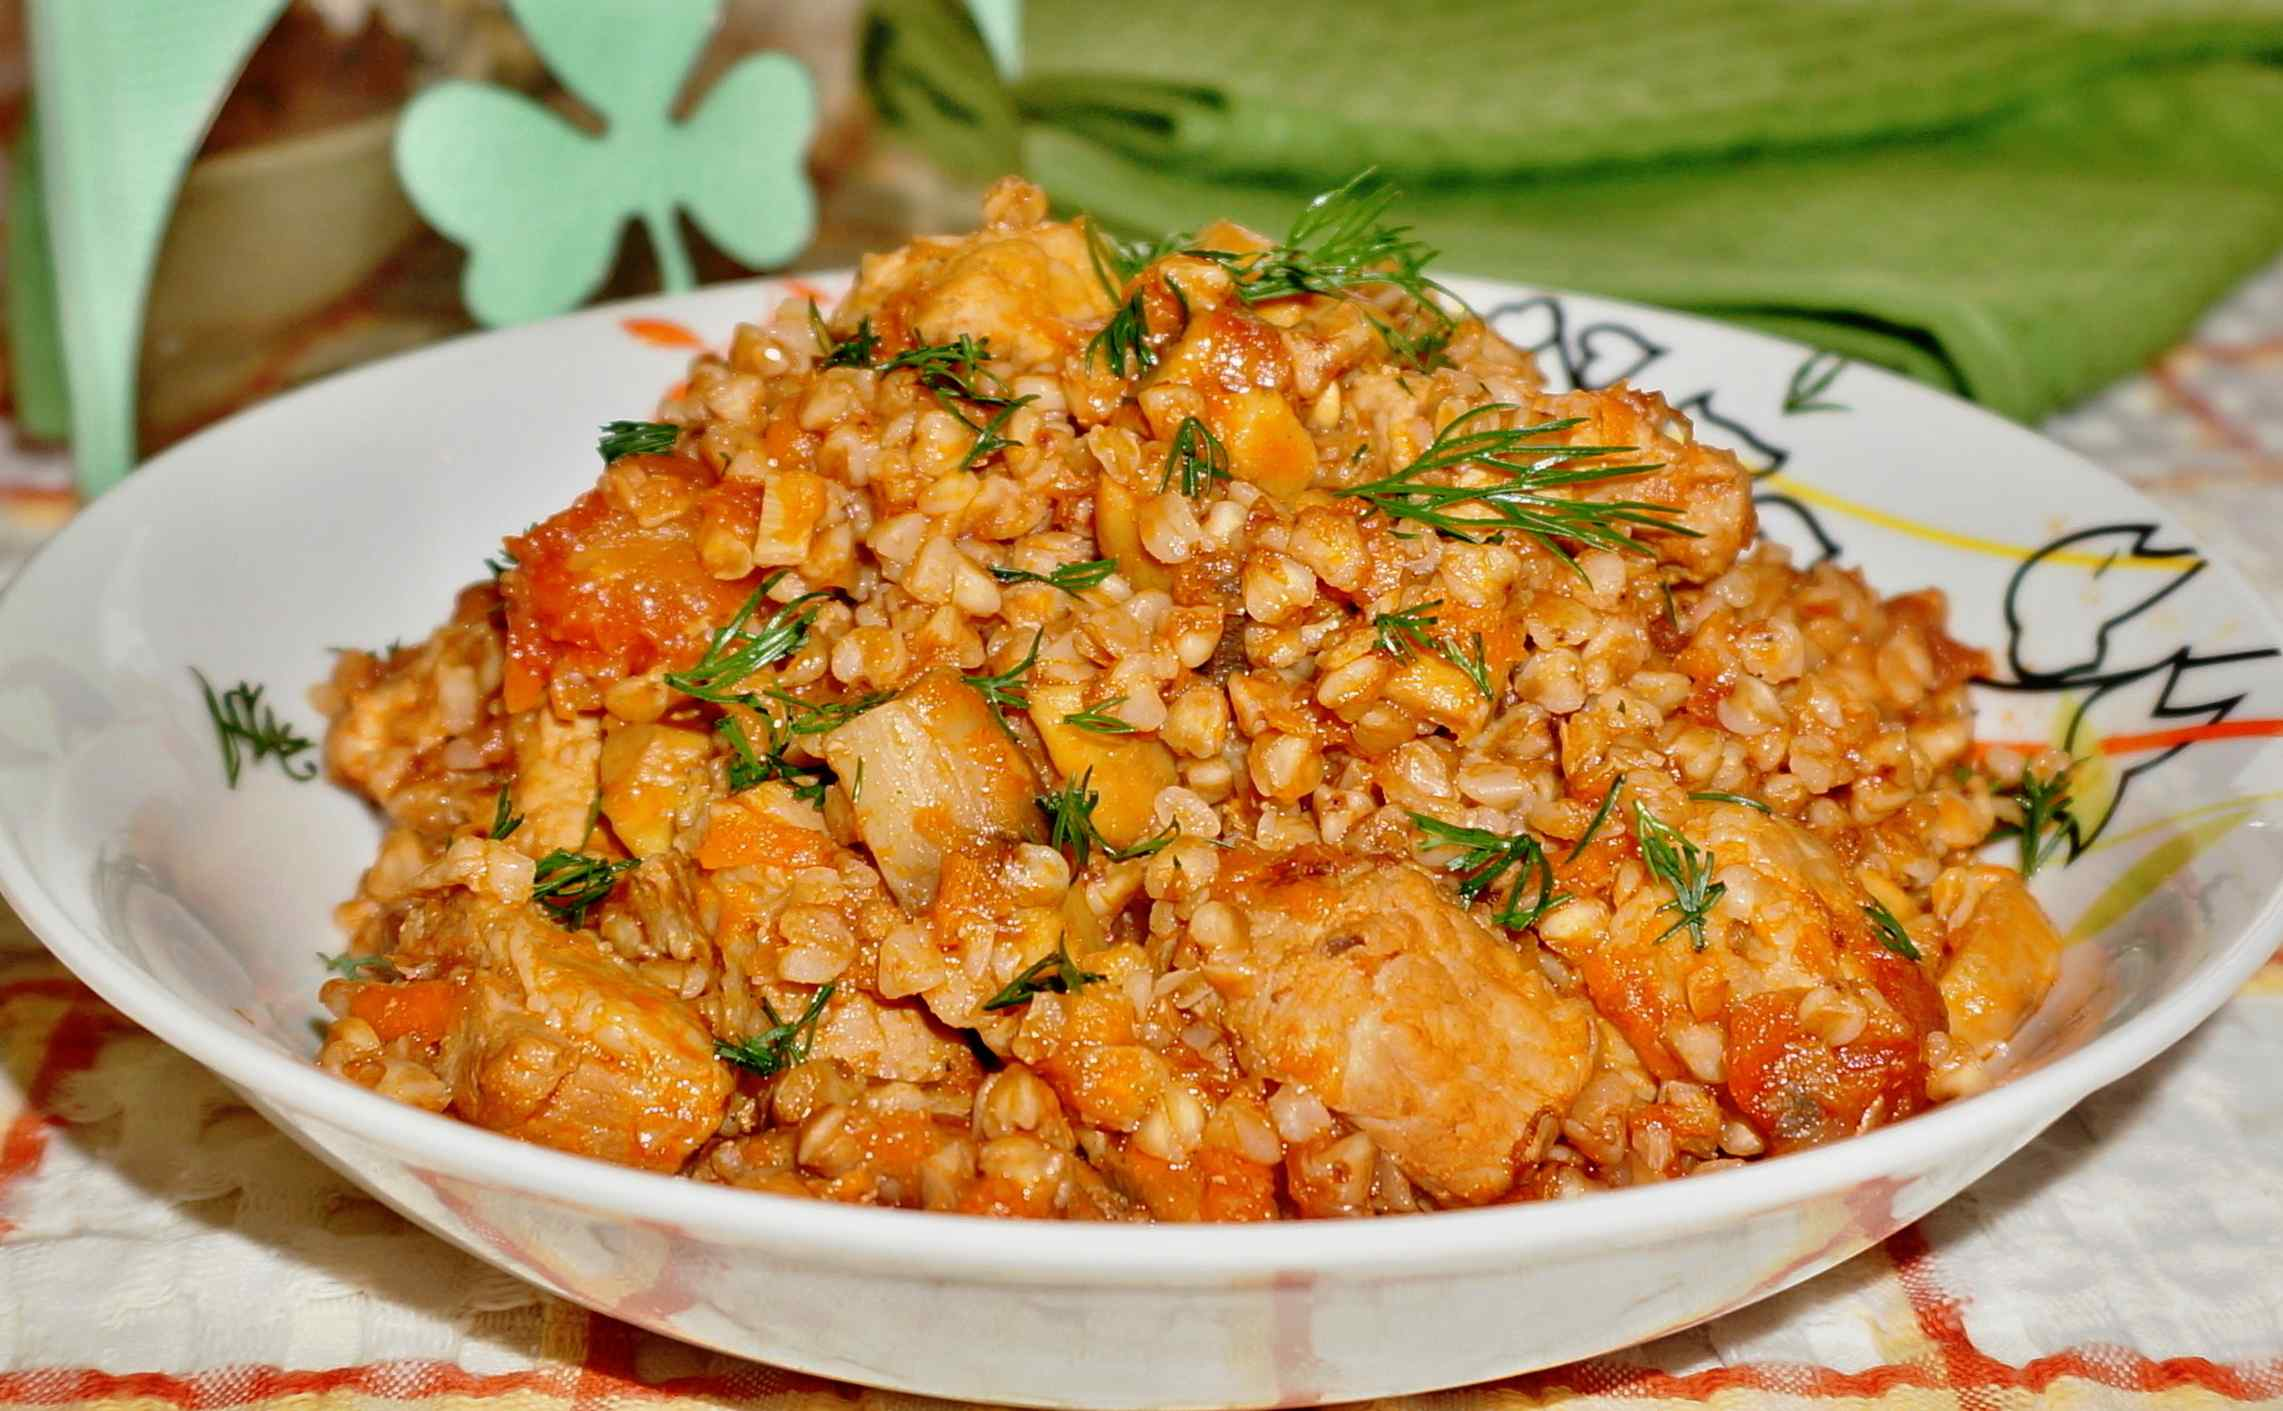 Рецепт из фарша и гречки рецепт с пошагово в